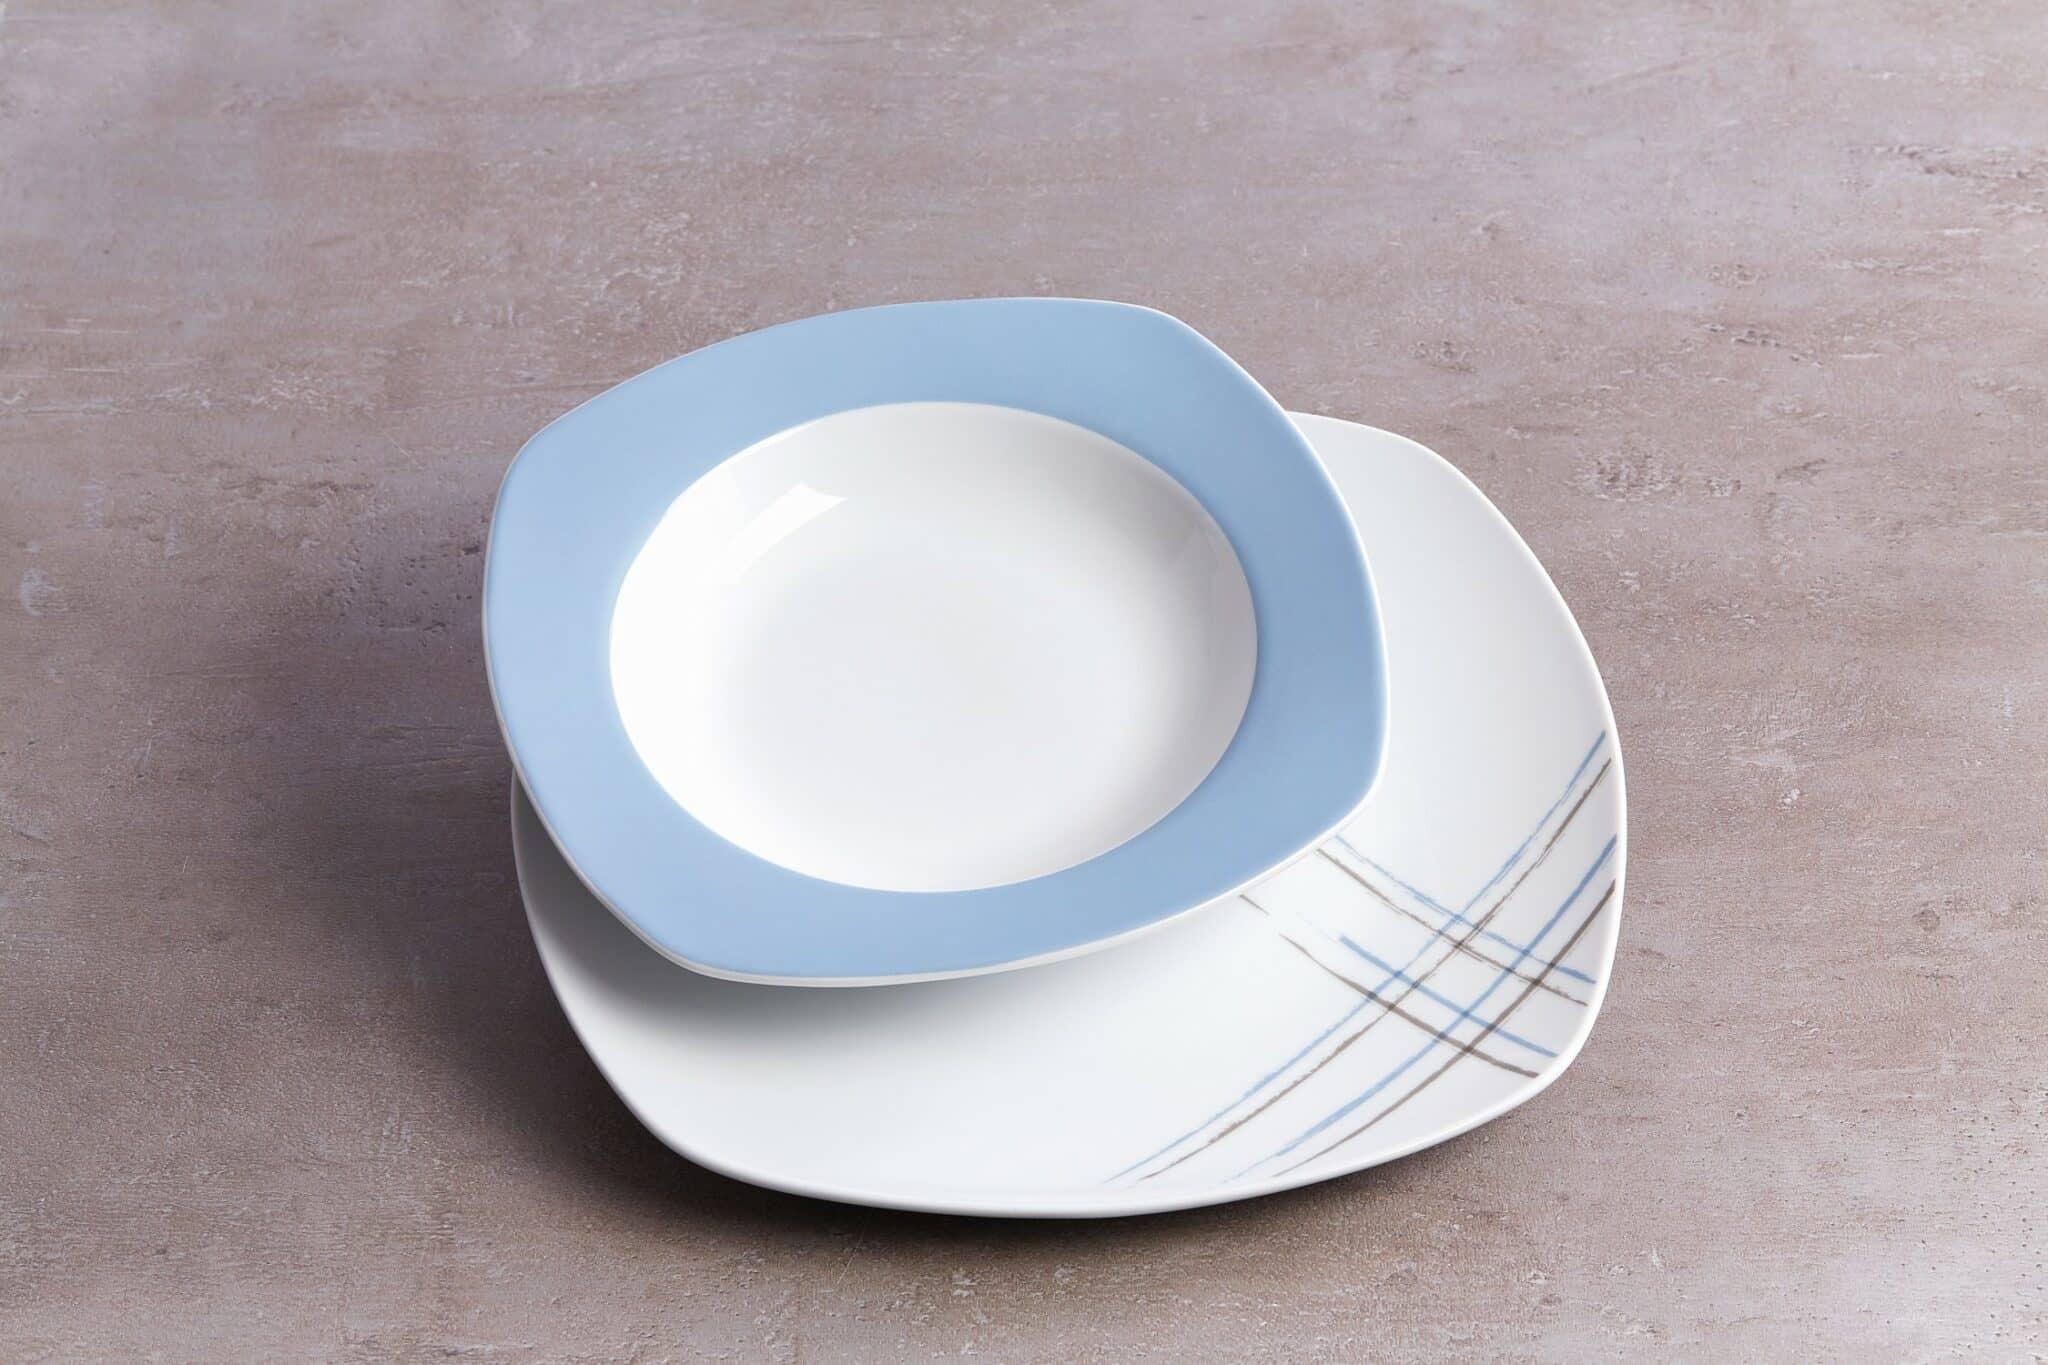 Ritzenhoff Tafelservice Porzellan Serie Blues 12 Tlg 6 Personen Neu Ebay